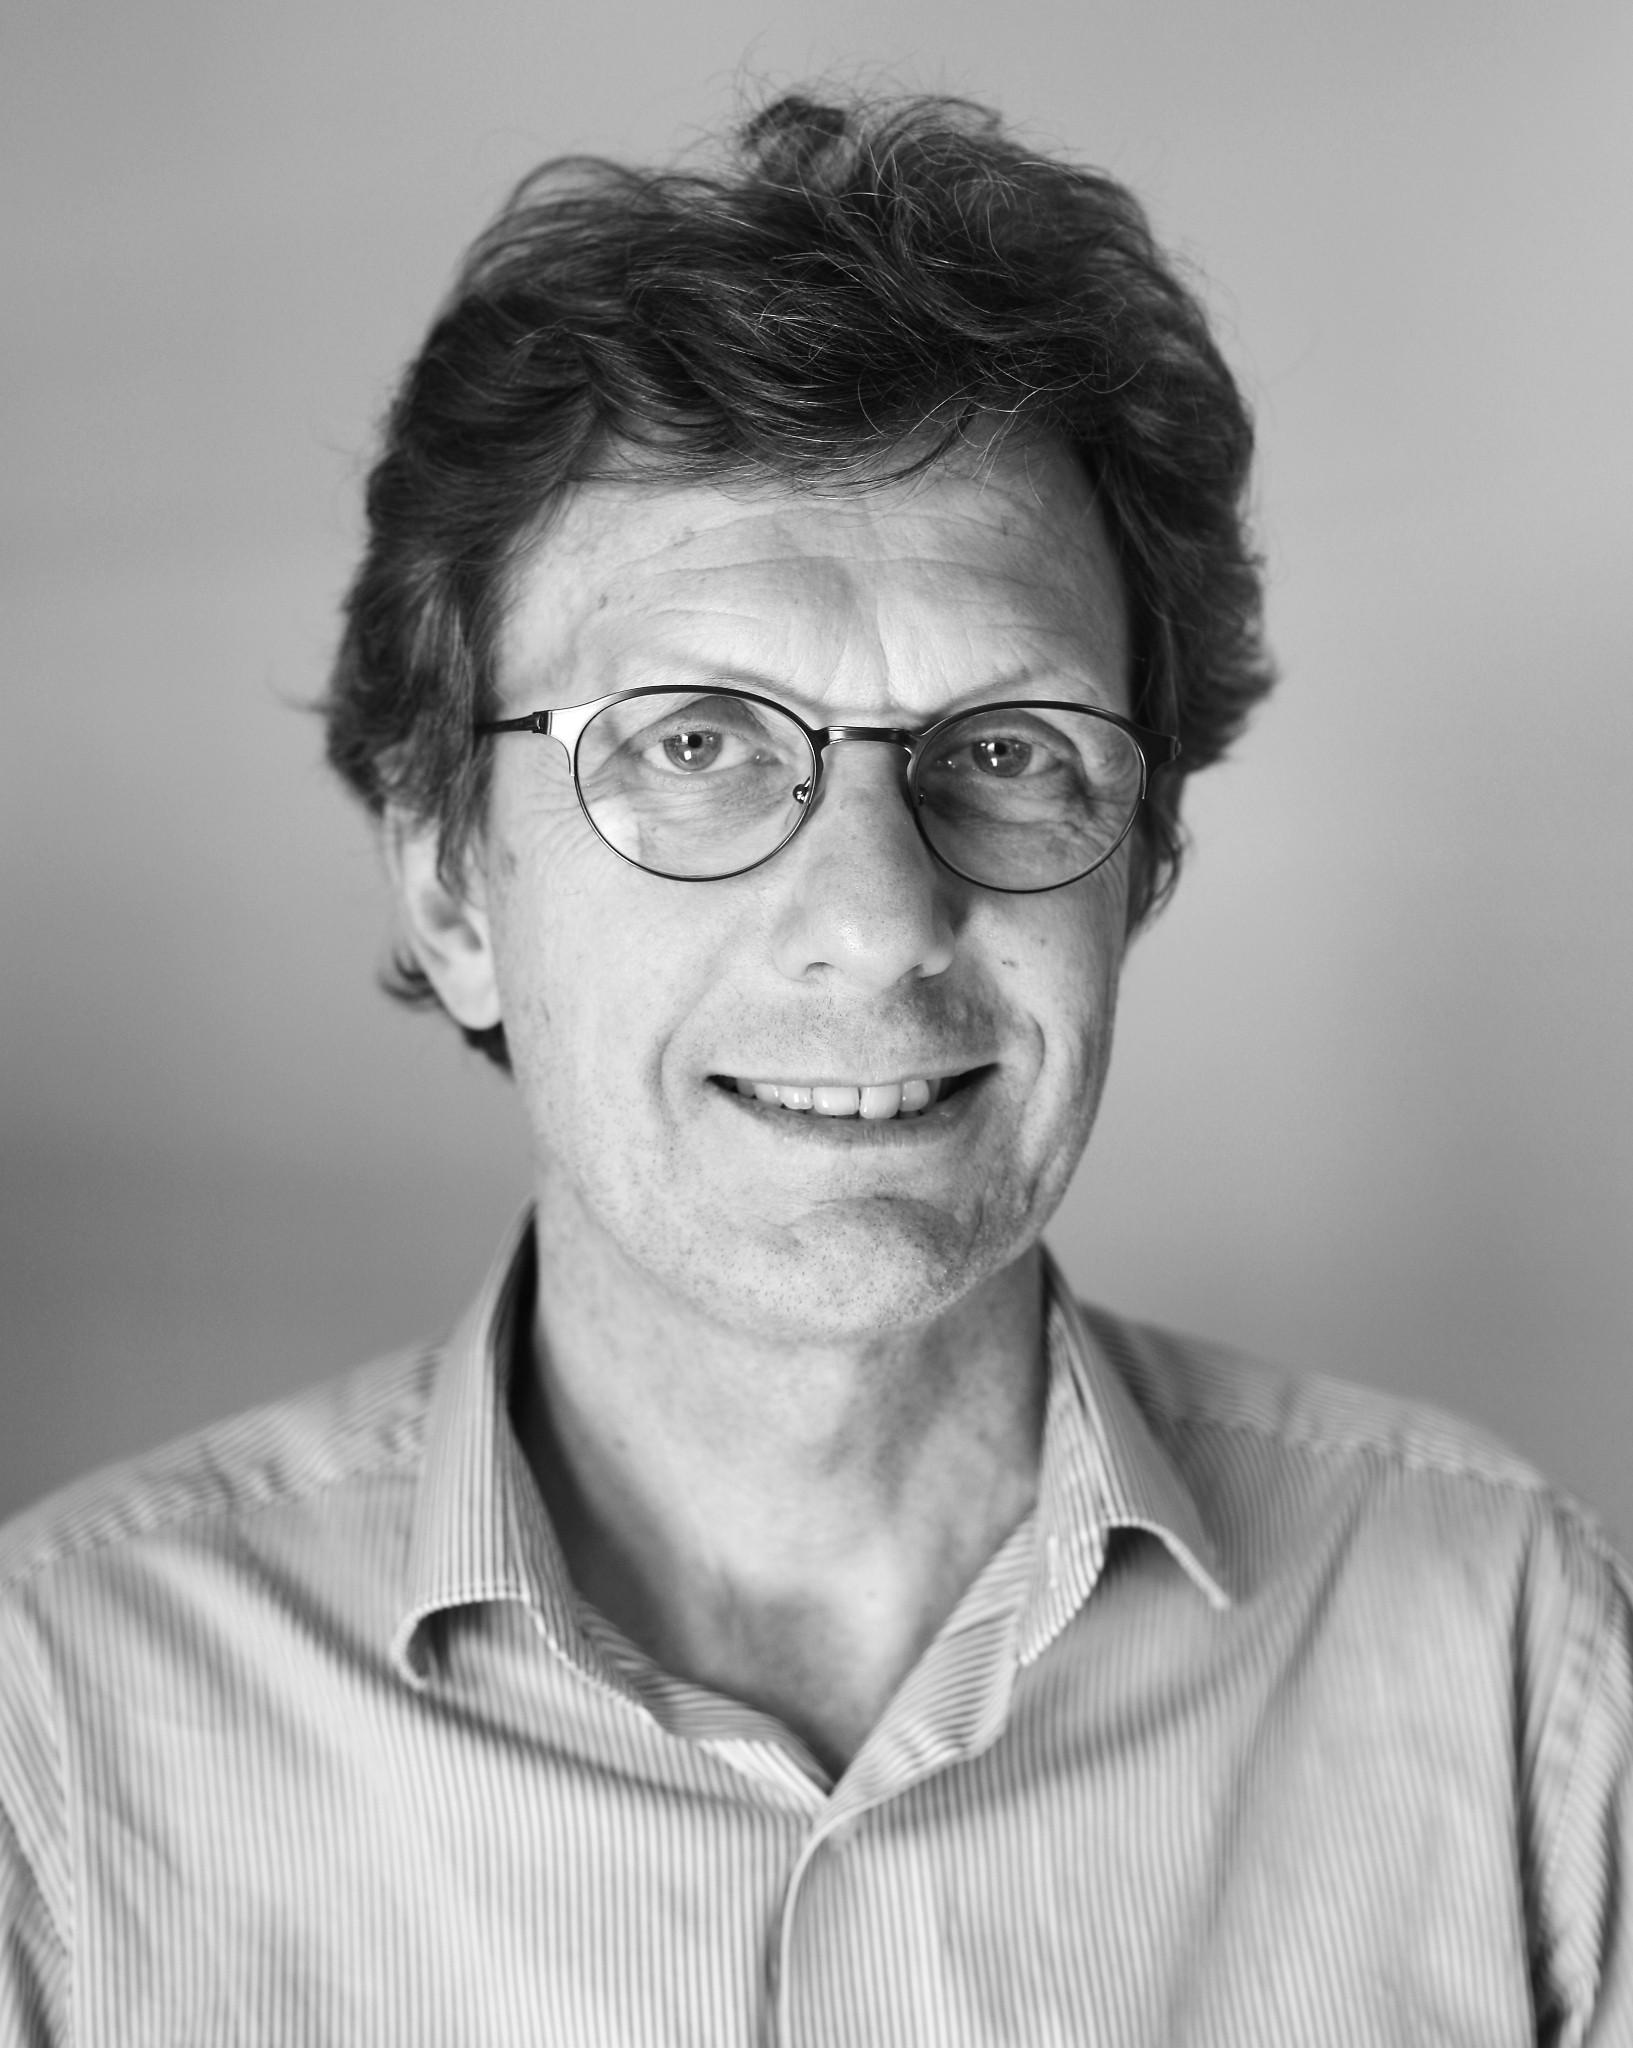 Benoit Vidal-Giraud - Via Aqua